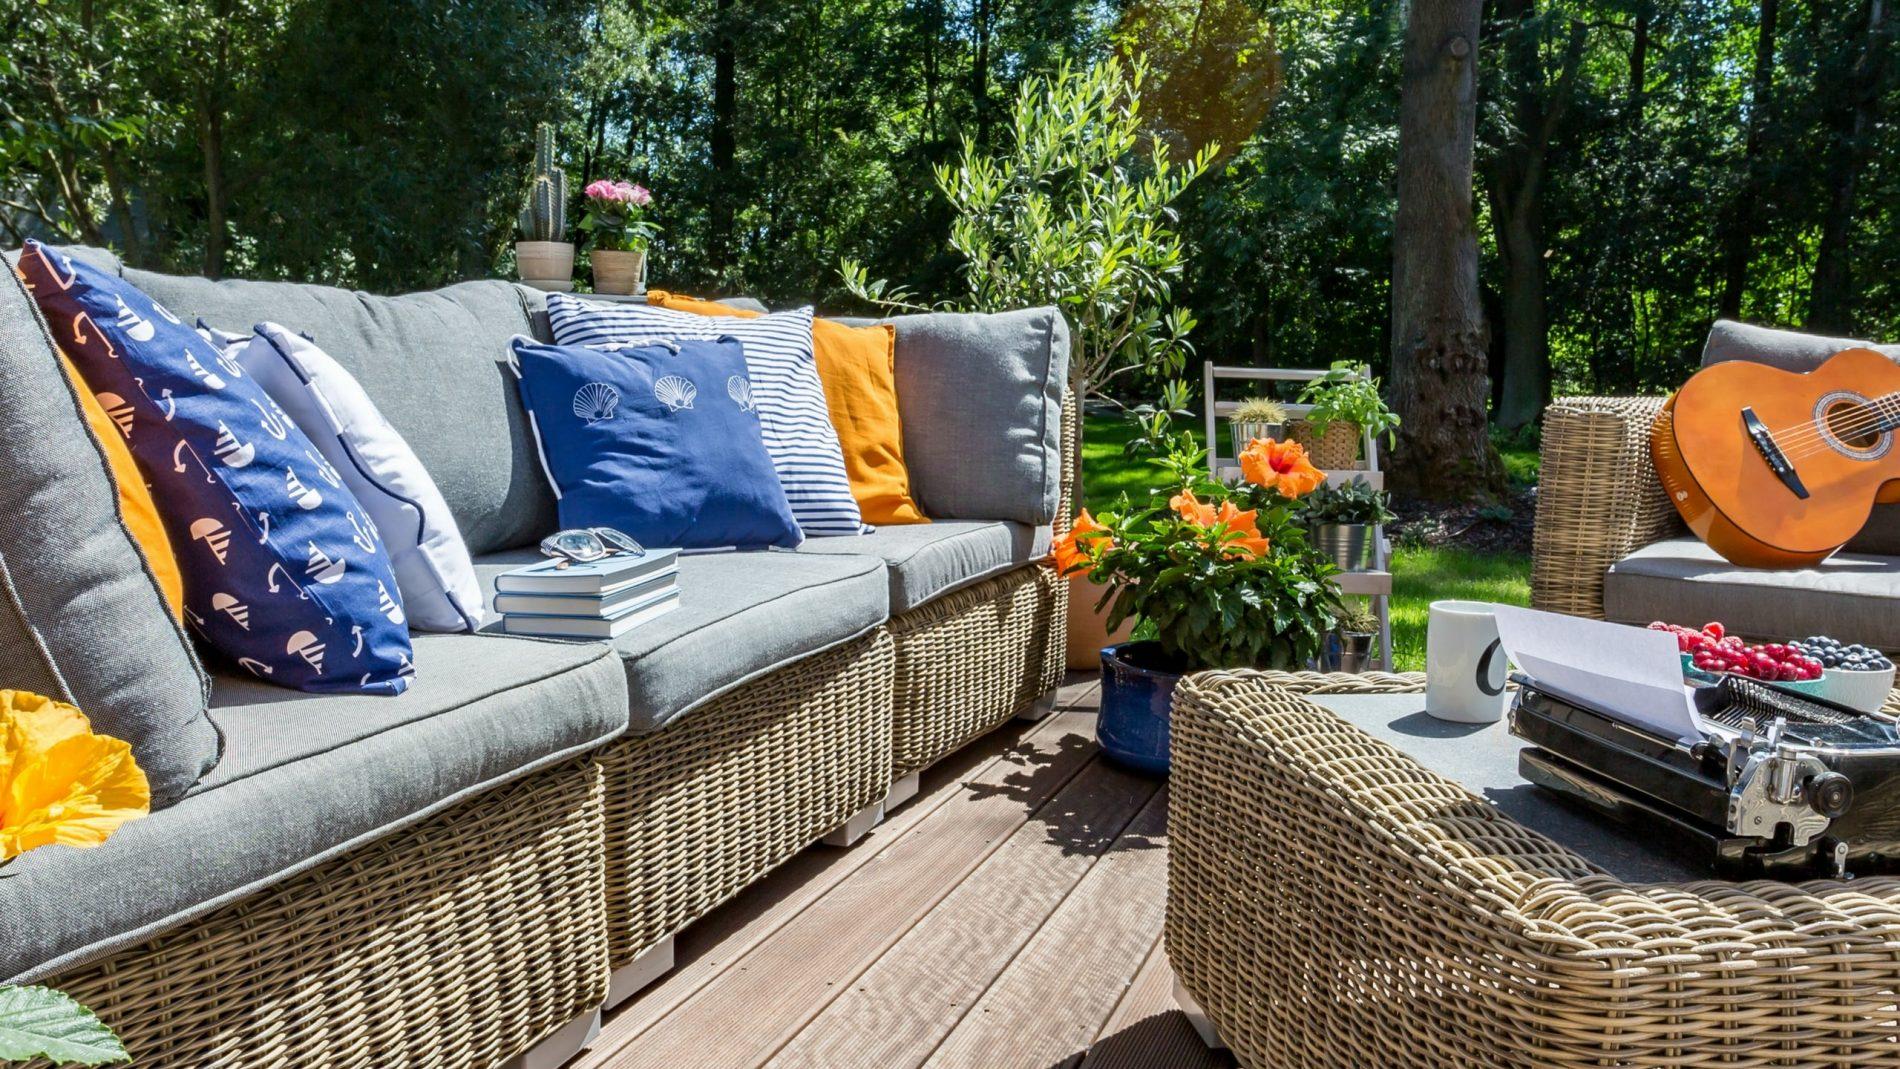 Buyer's Guide: Outdoor Patio Furniture